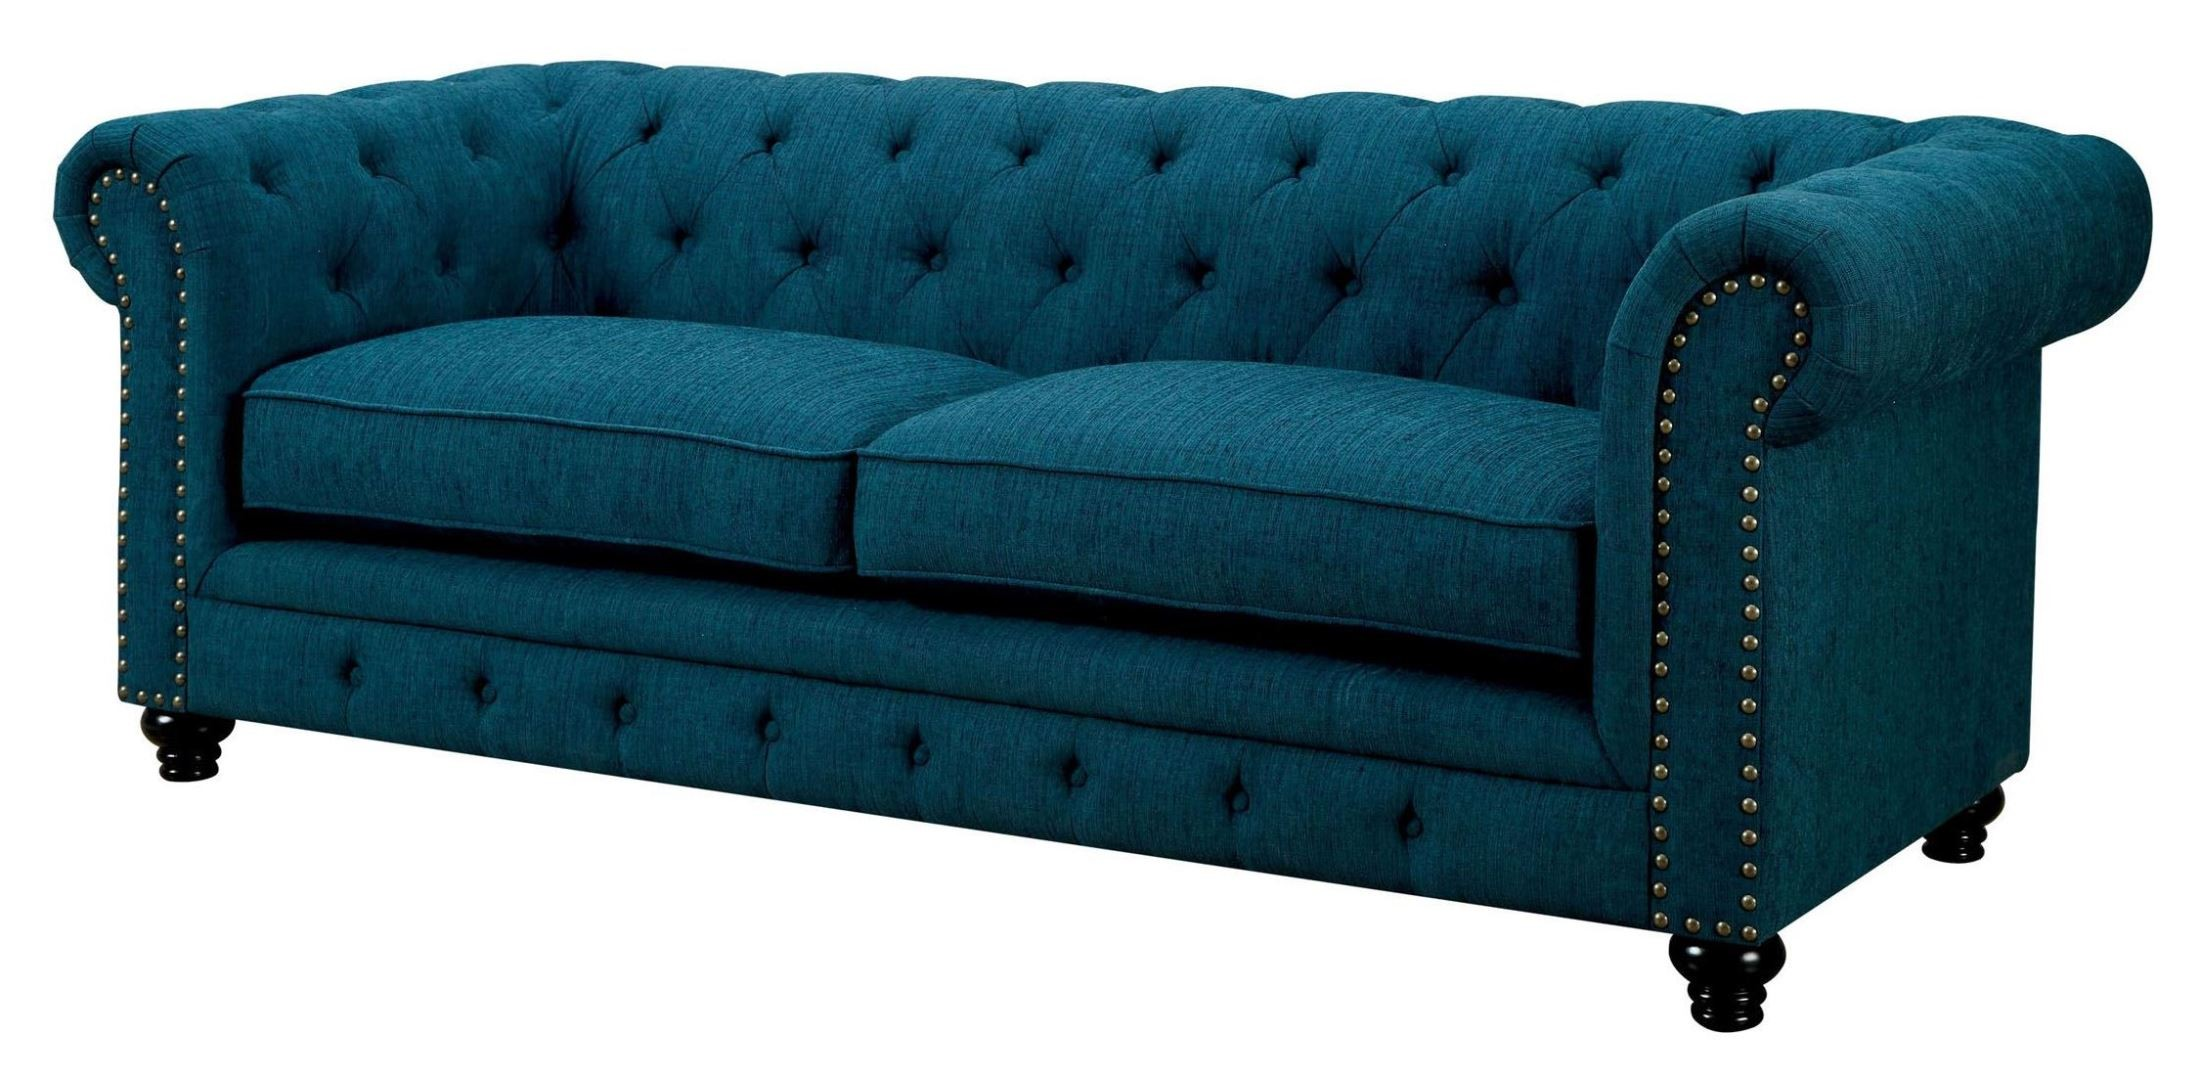 dark teal chair high aldi stanford fabric sofa from furniture of america